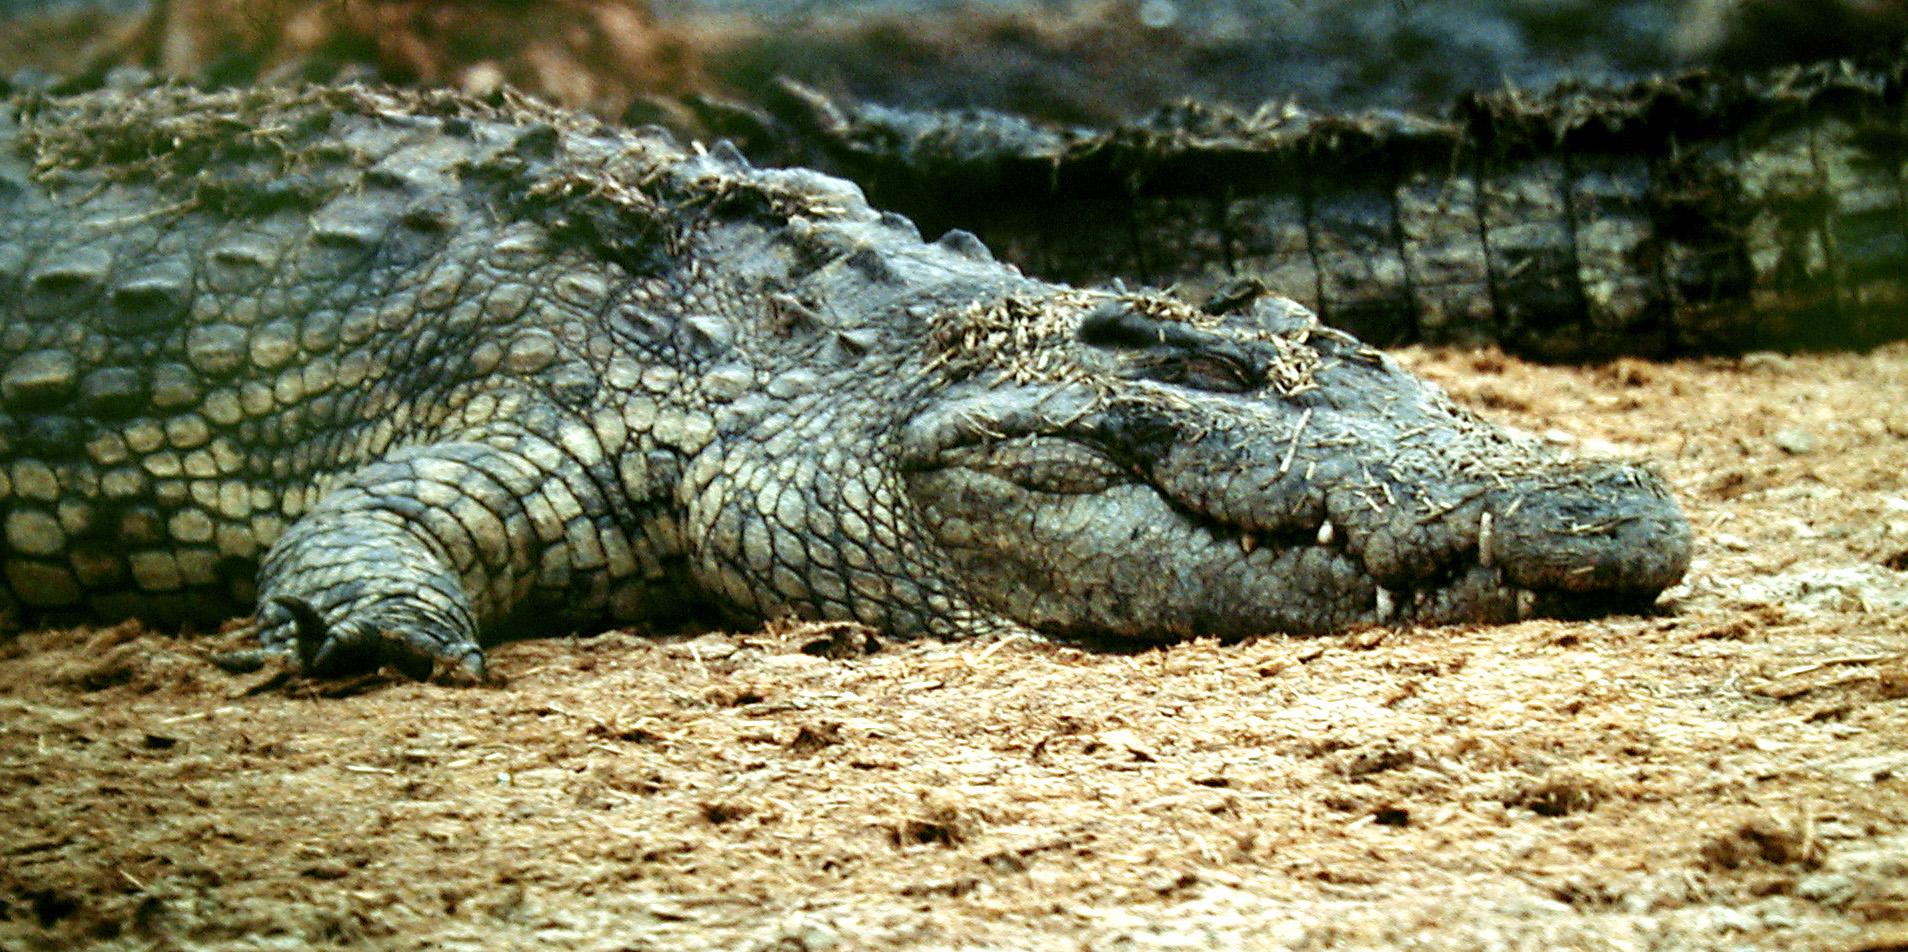 Crocodiles of the Serengeti sleeping.